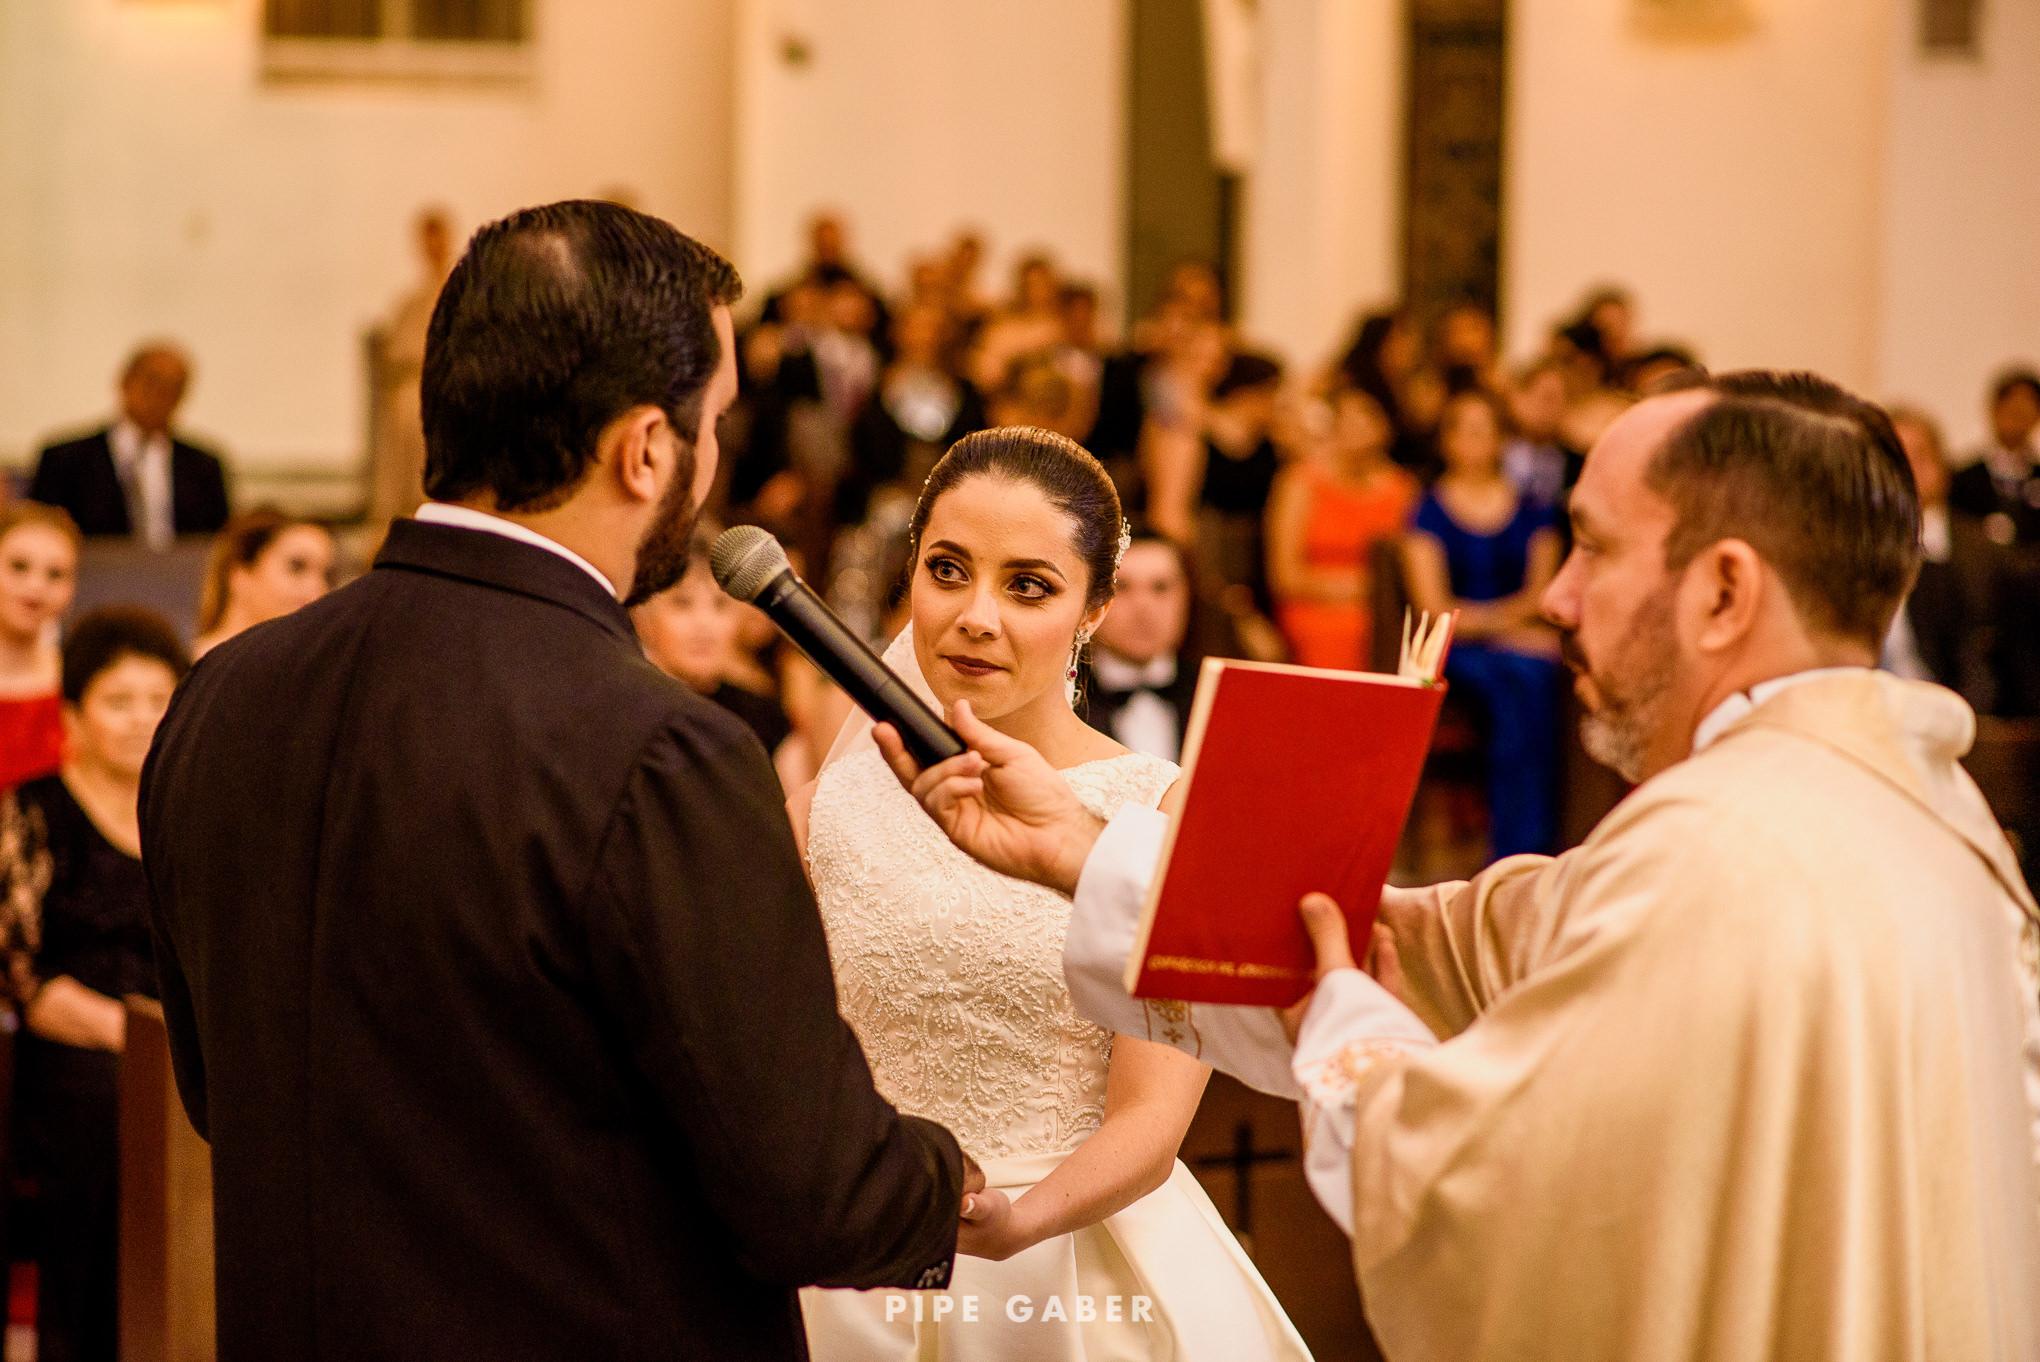 17_02_18_WEDDING_AIDITA_NEZBIT_MIGUEL_DOGRE_217_web.jpg